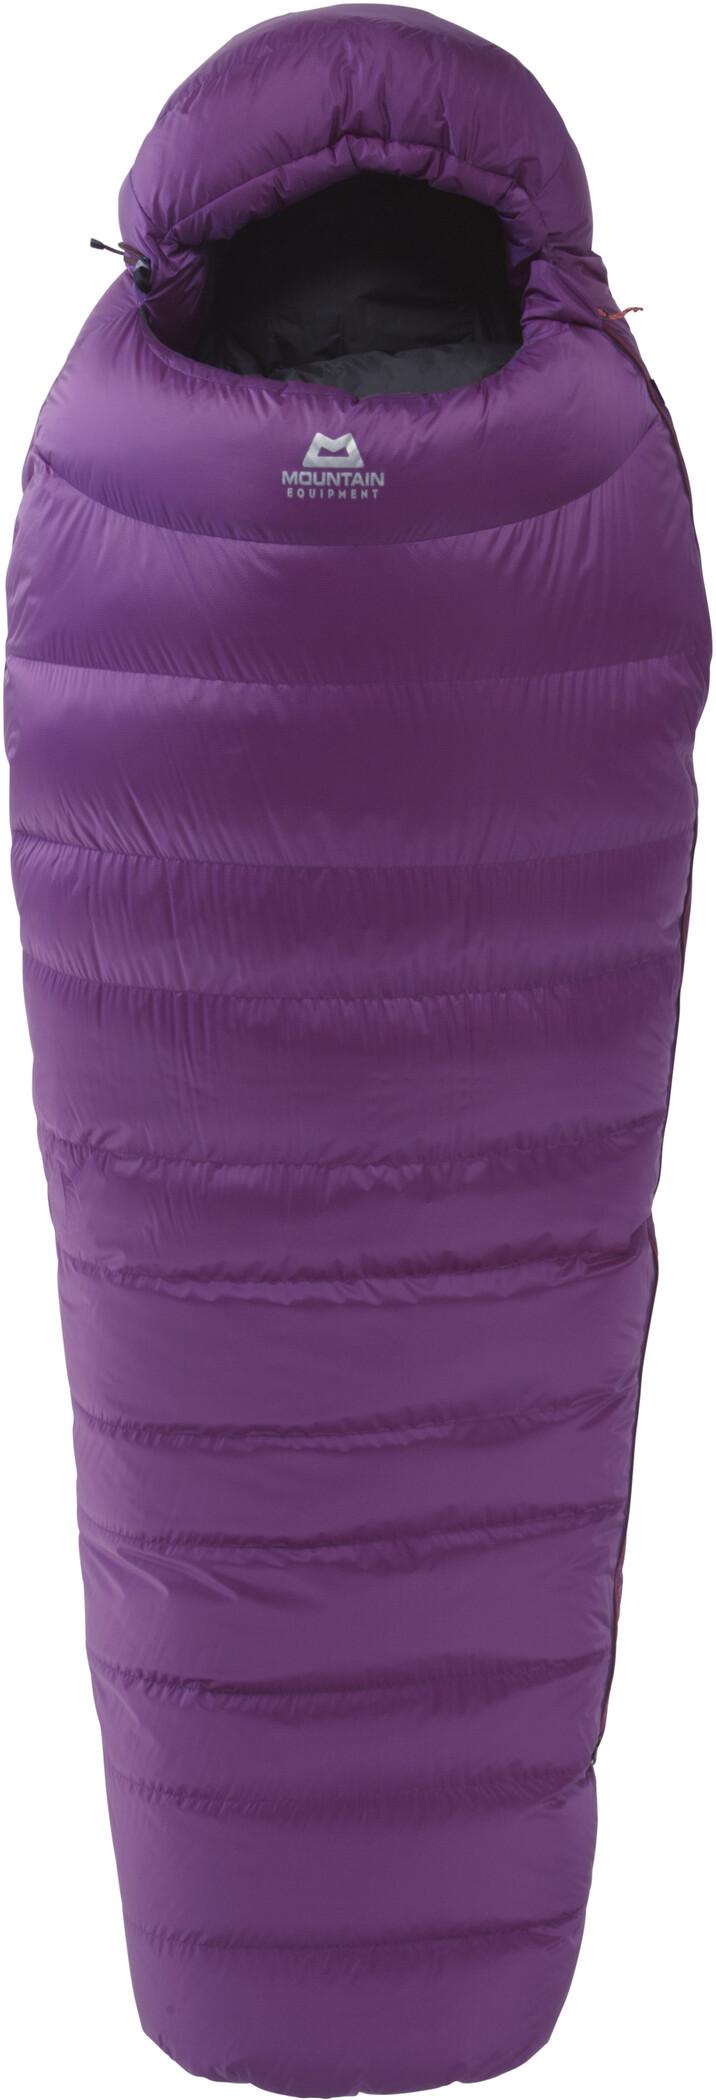 7 B(M) US, Aruba BlueInk BlueFuchsia Purple) ASICS